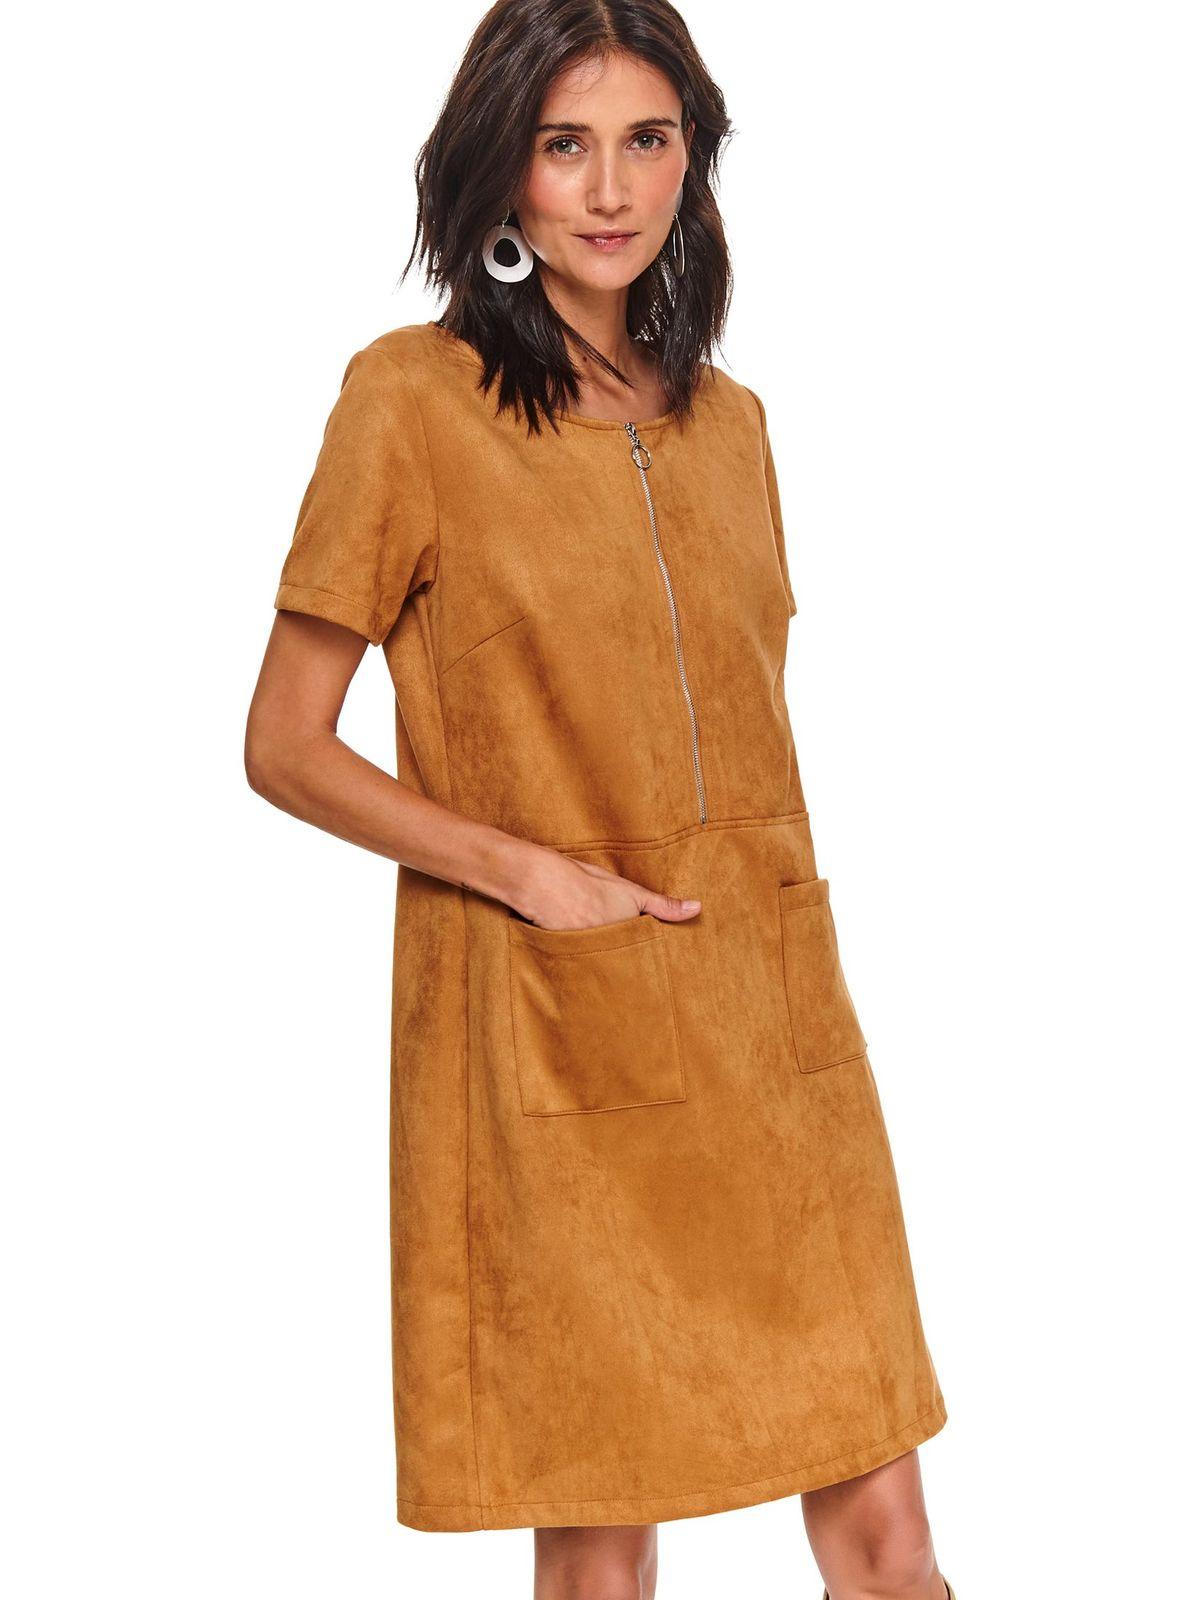 Lightbrown dress velvet a-line with pockets zipper accessory